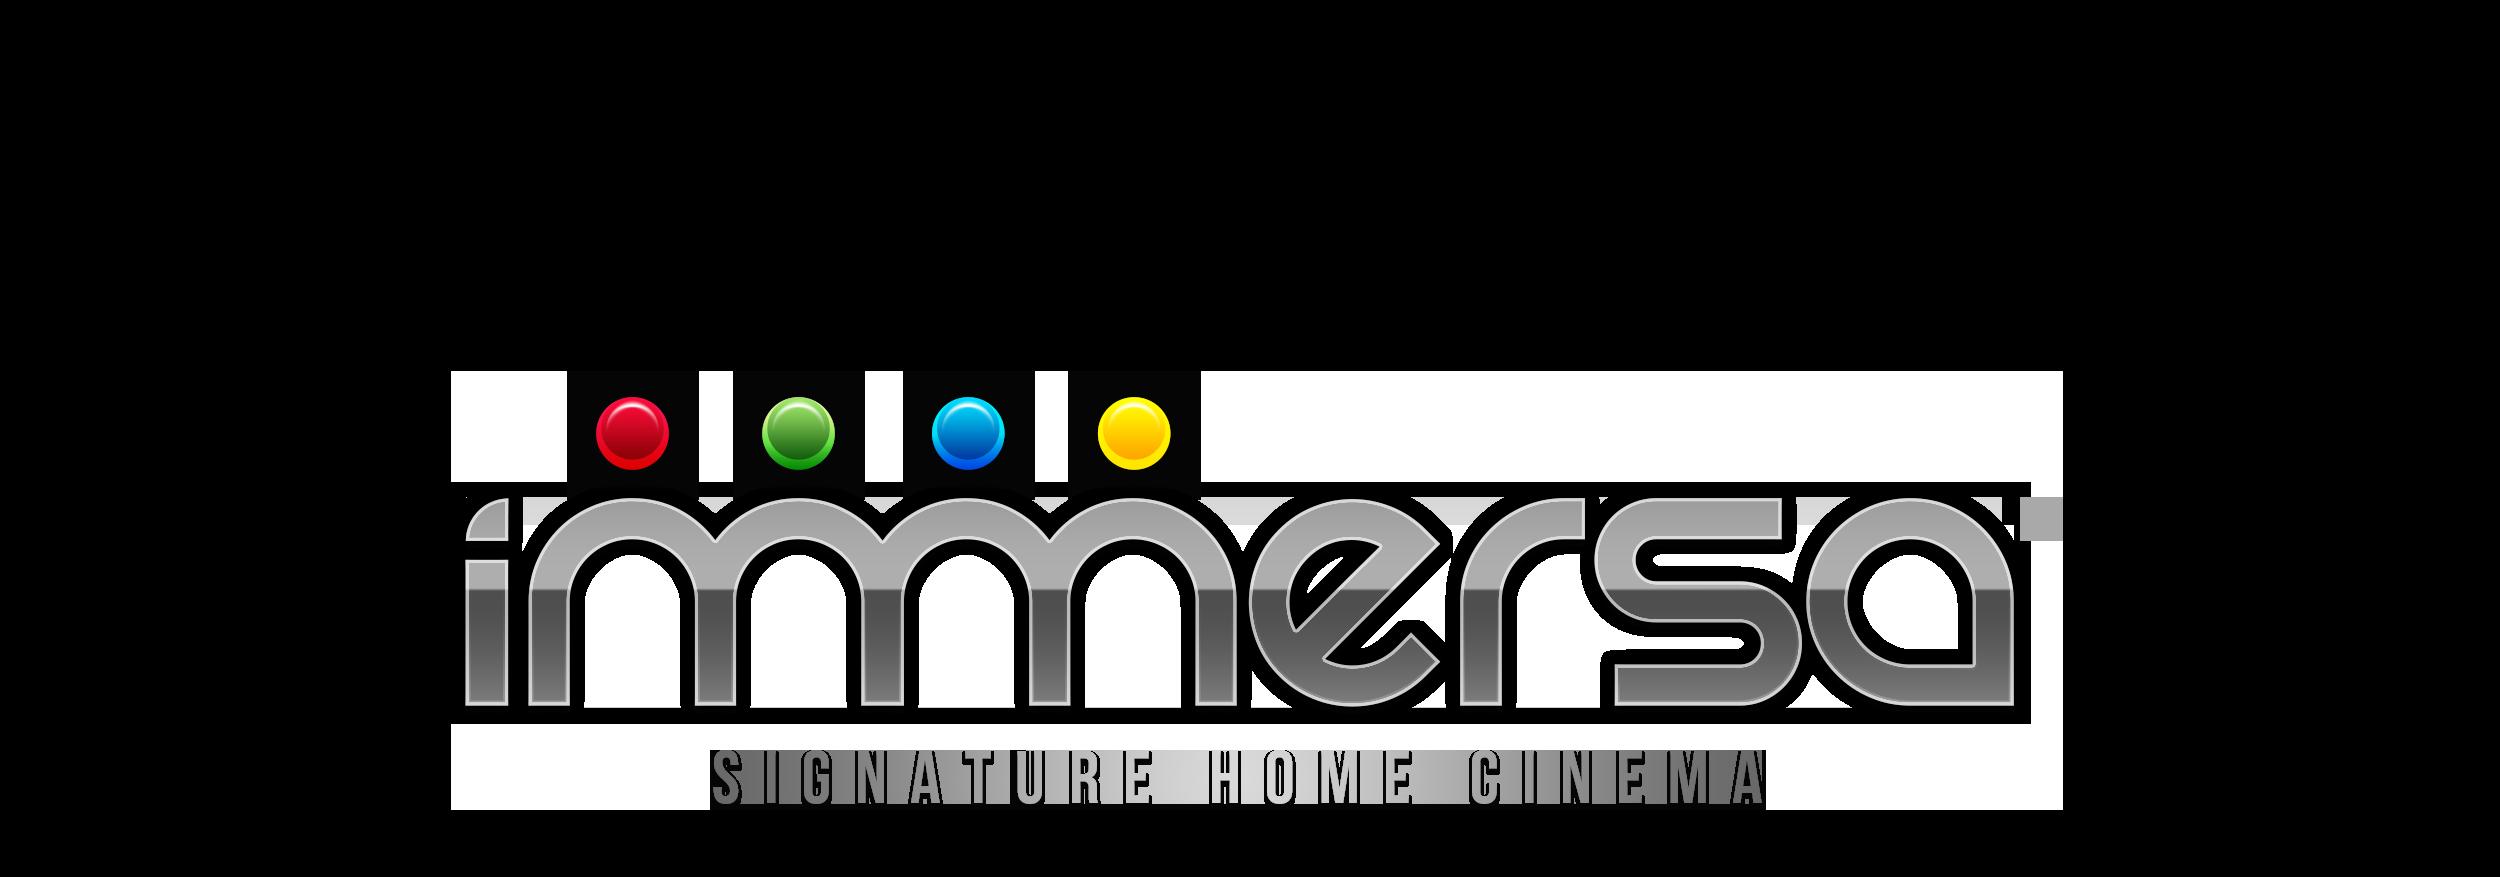 Immersa Cinema Logo.png